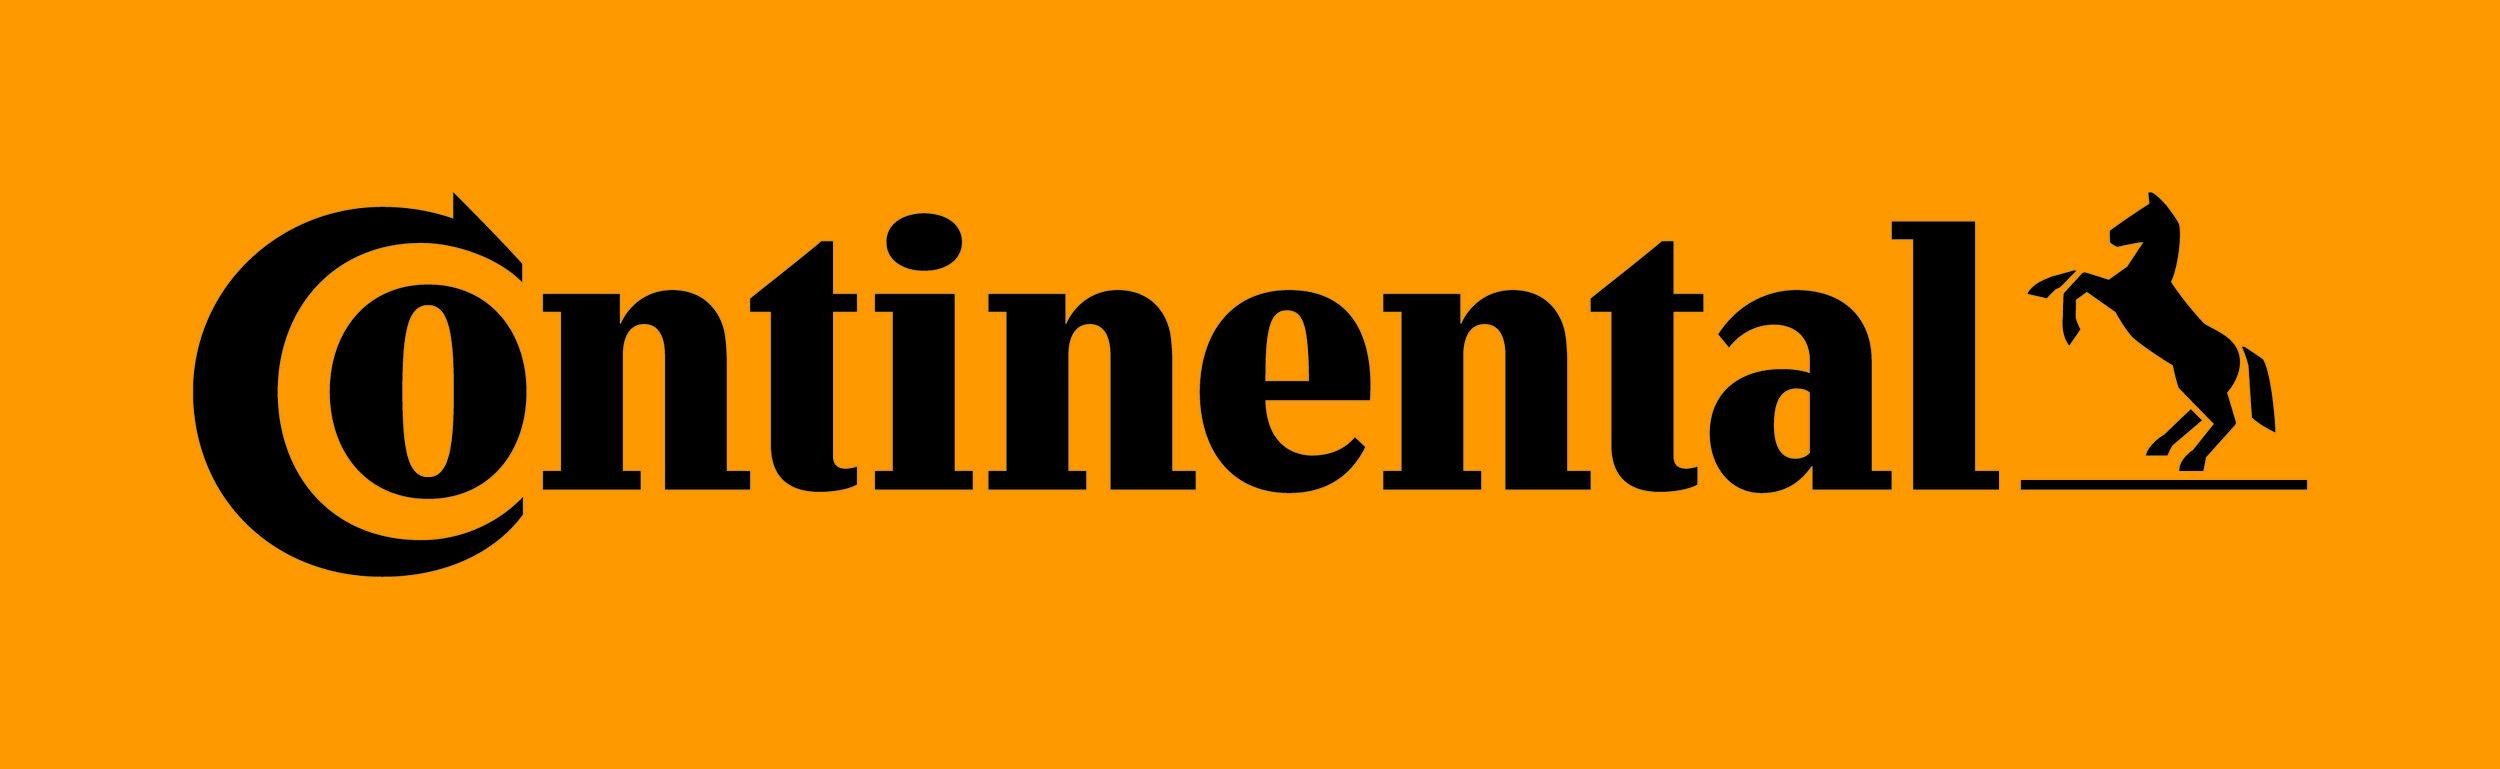 Continental_Logo_Black_on_yellow.jpg